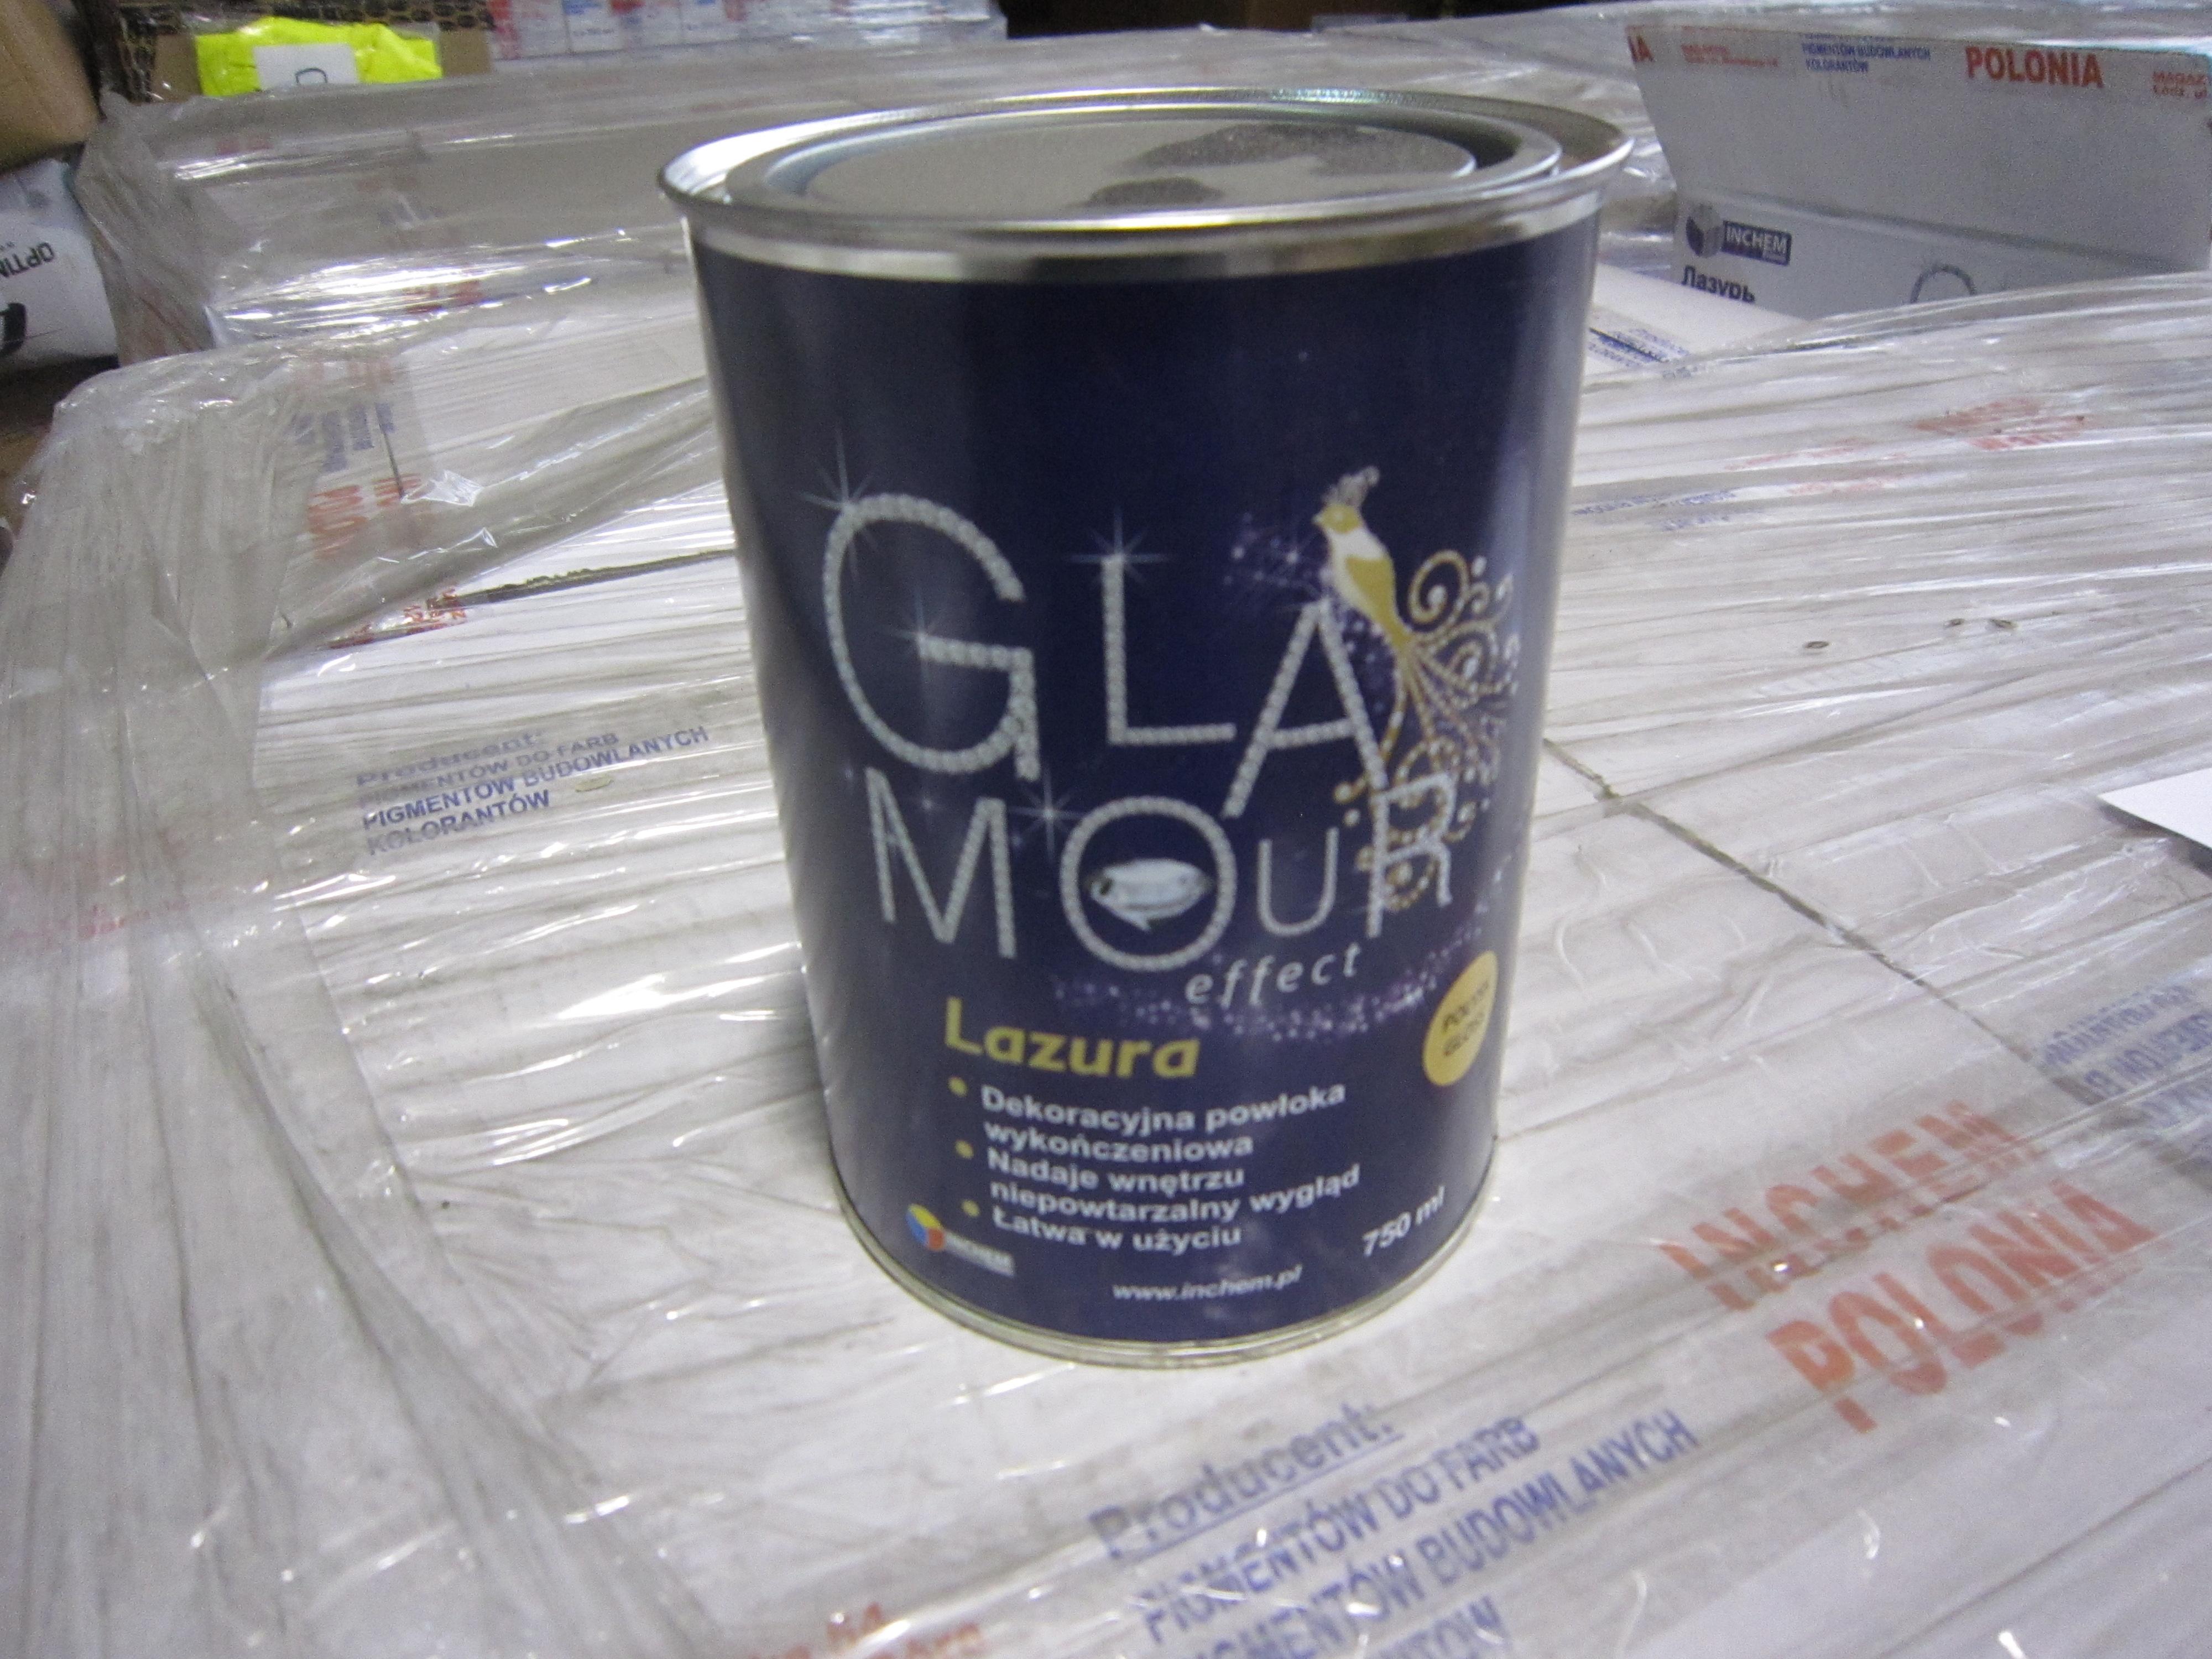 432 x Tins Glamour Effect Varnish Matt Finish | RRP £7,750 - Image 2 of 4